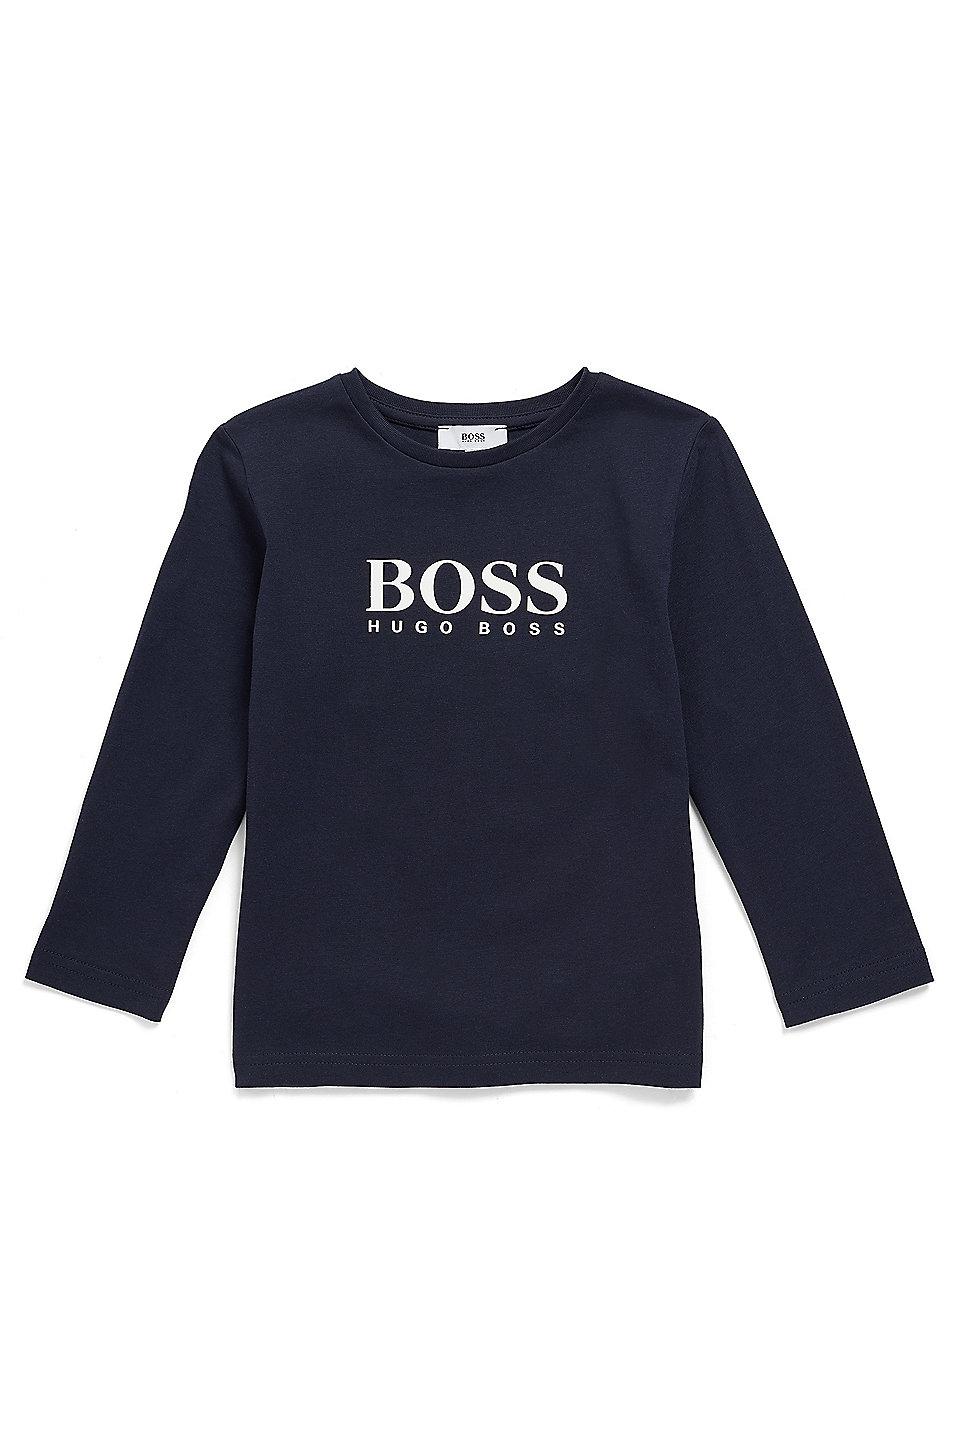 6e9658fdc8 BOSS - Kids' long-sleeved T-shirt with high-density logo print